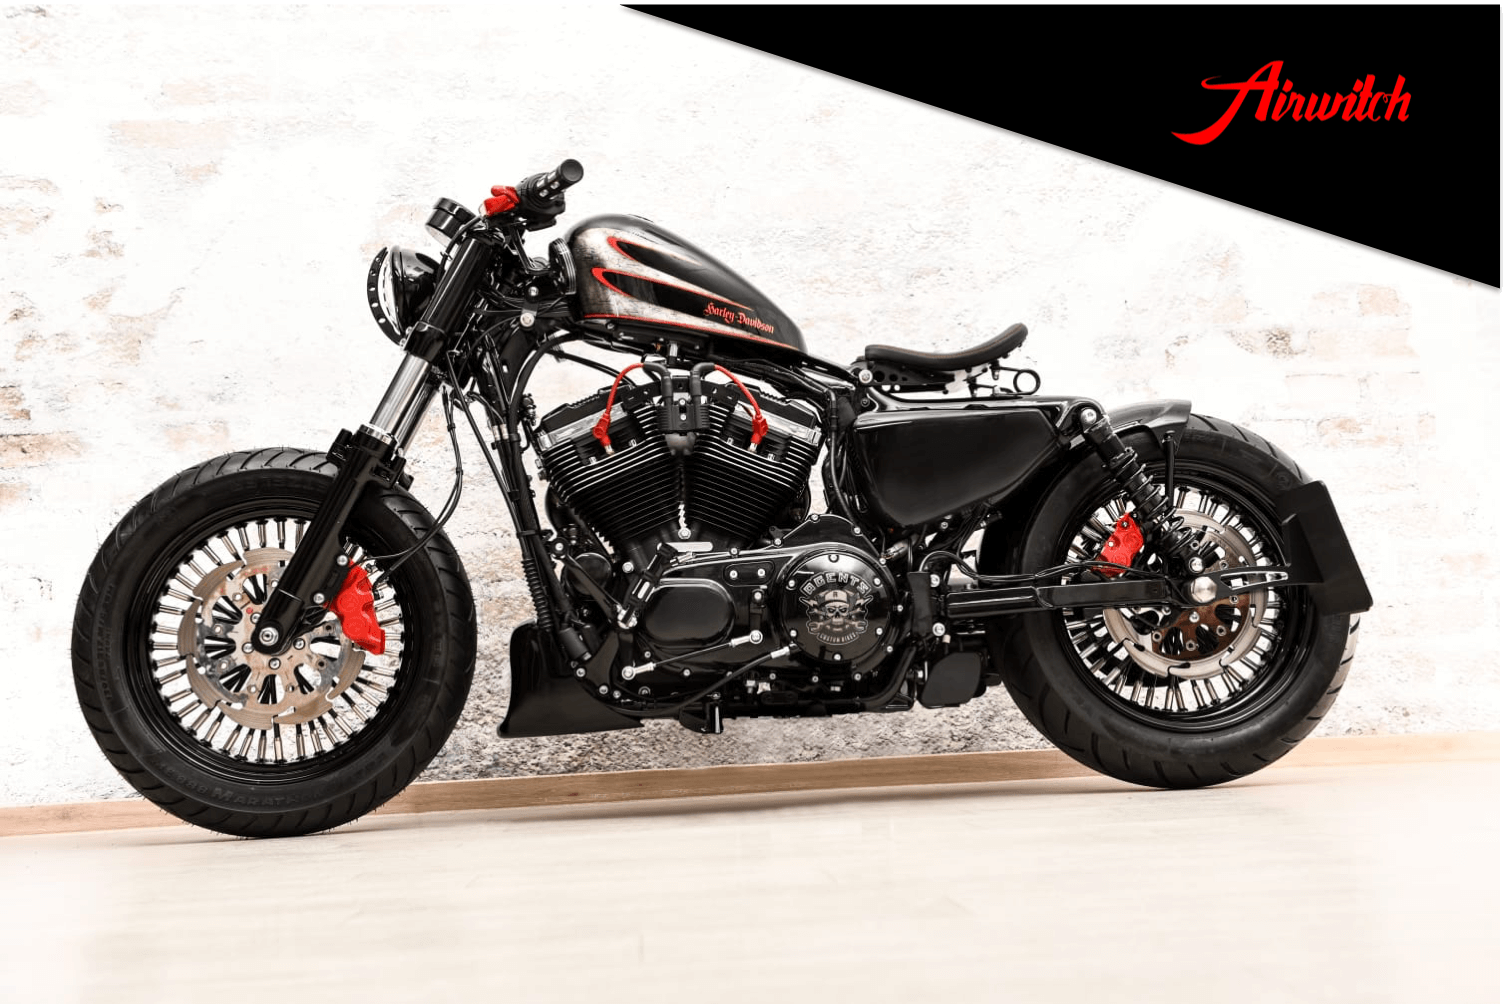 Custom Bike Paint Black Red Berlin Harley-Davidson Sportster 48 Scallops Lackierung Hardcore